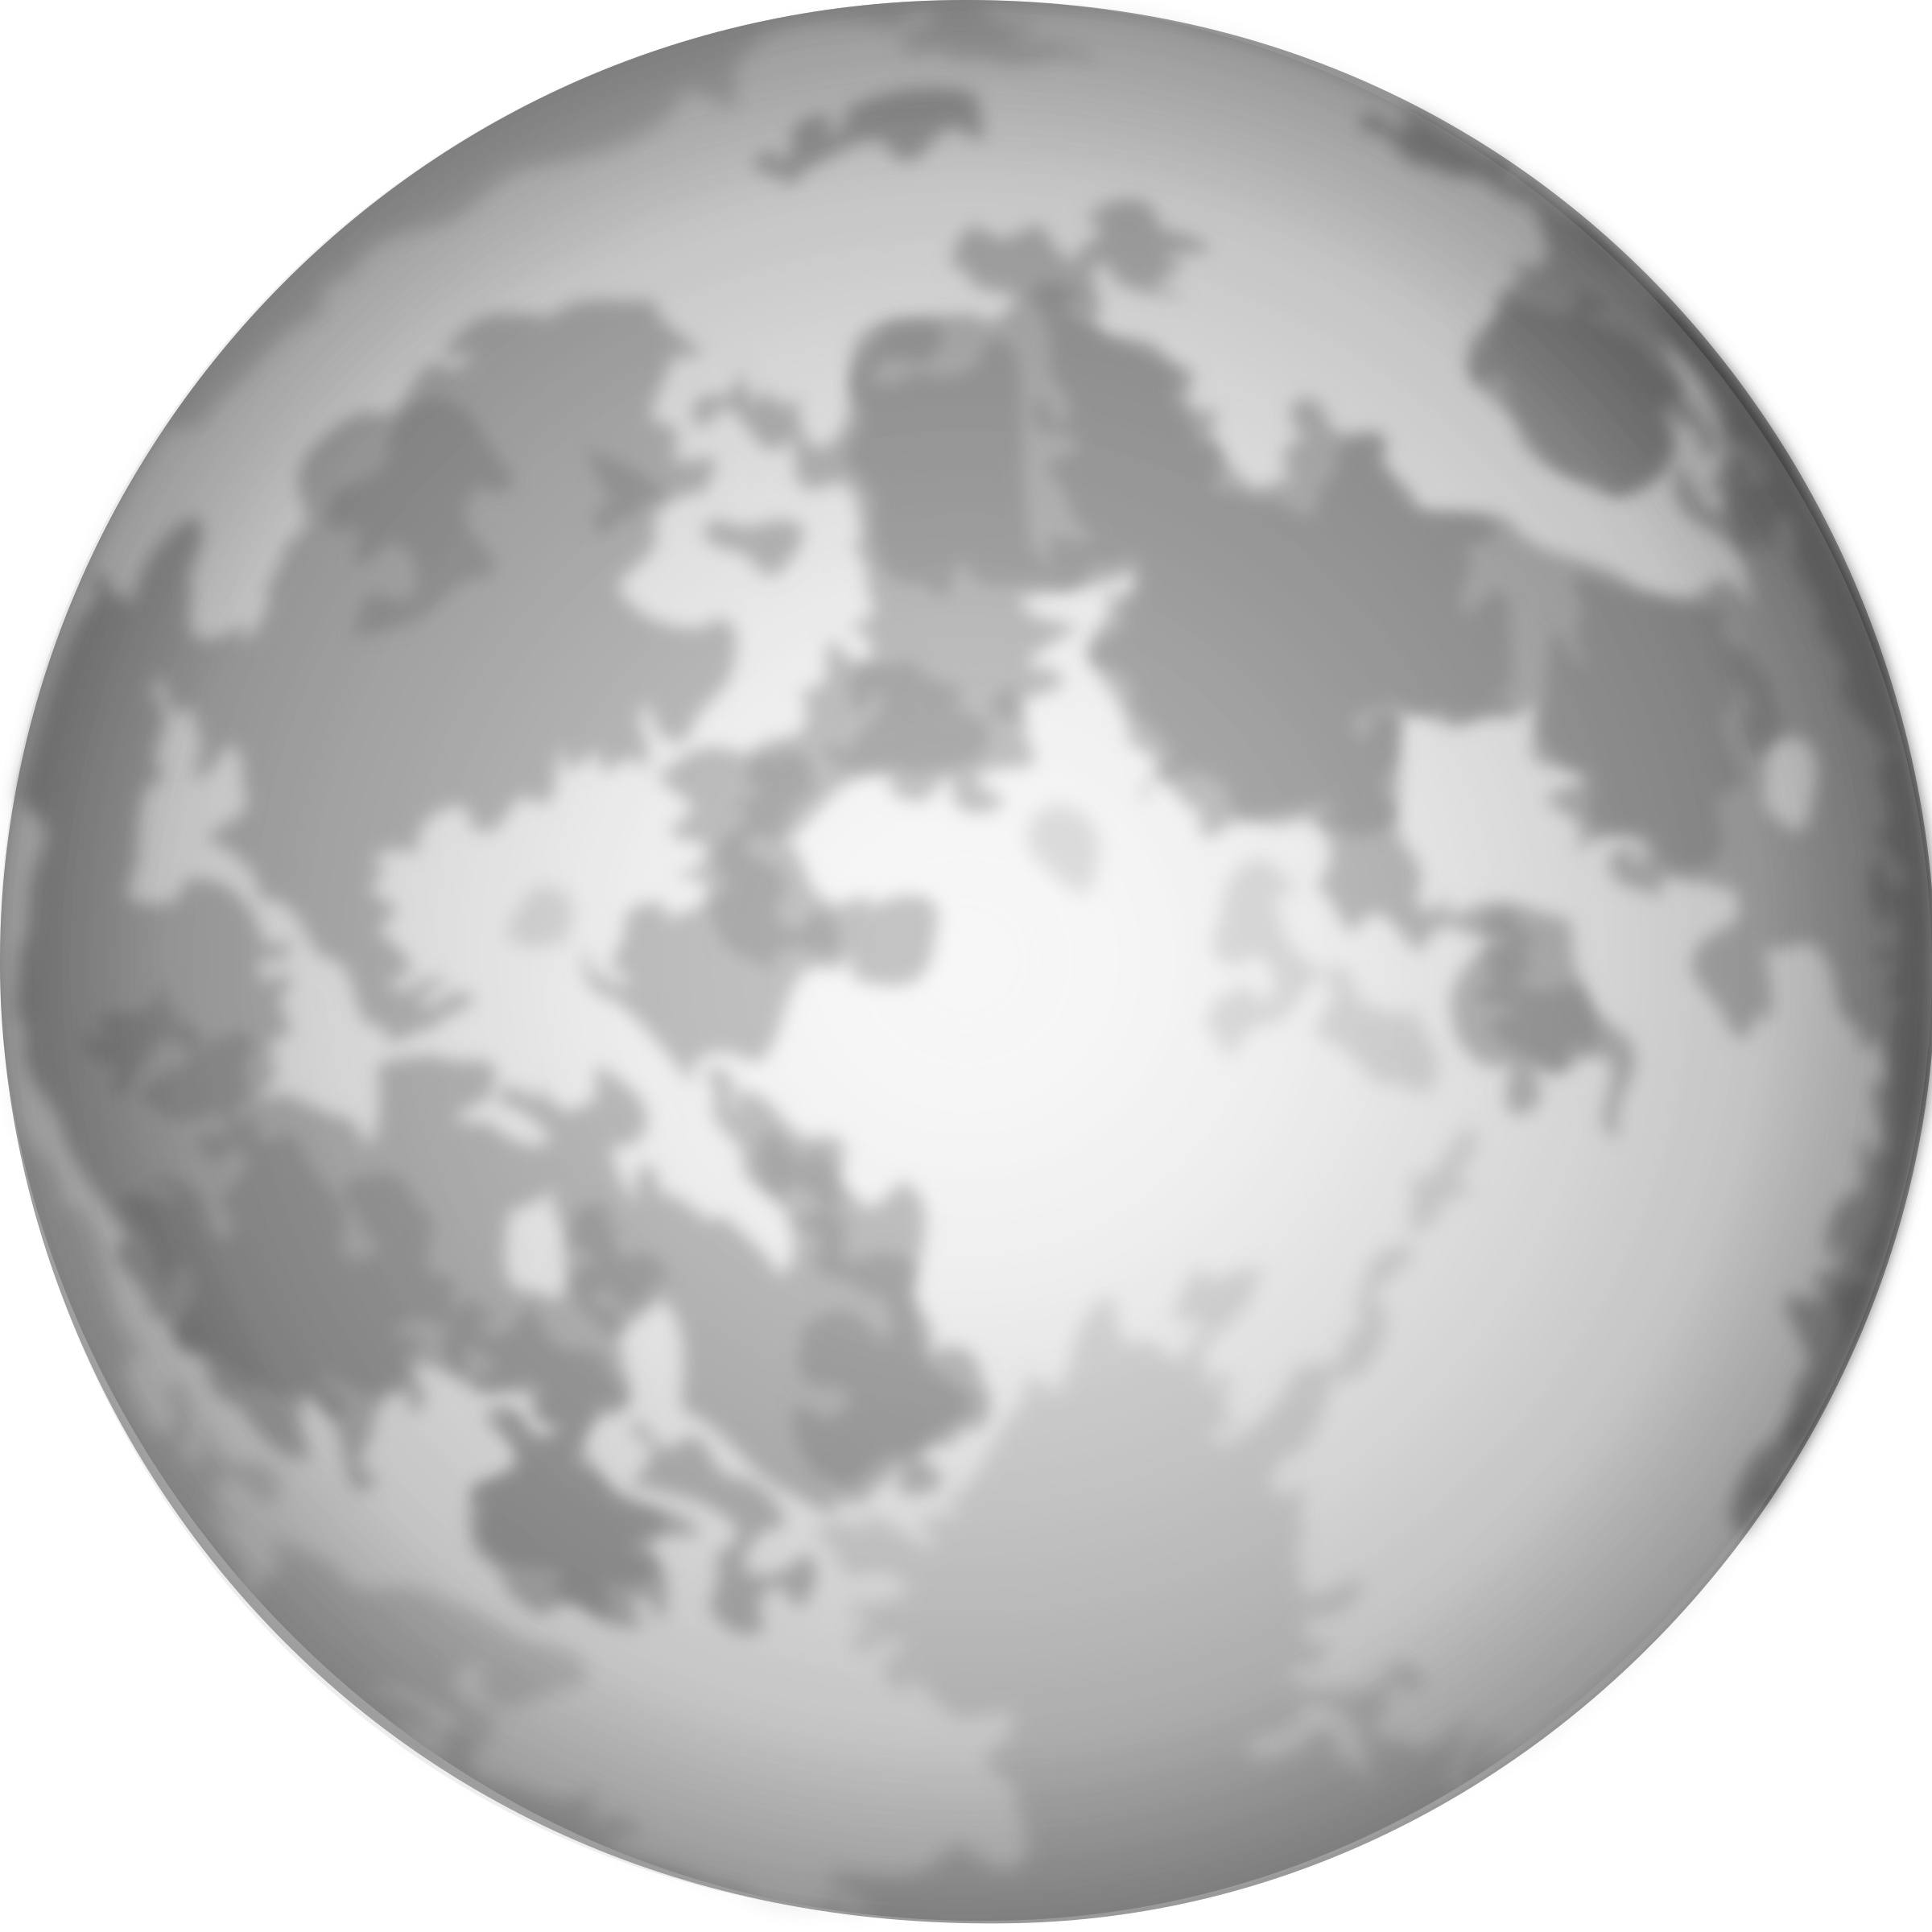 Moon Transparent Clipart Halloween Brigh-Moon Transparent Clipart Halloween Bright Full Moon-13